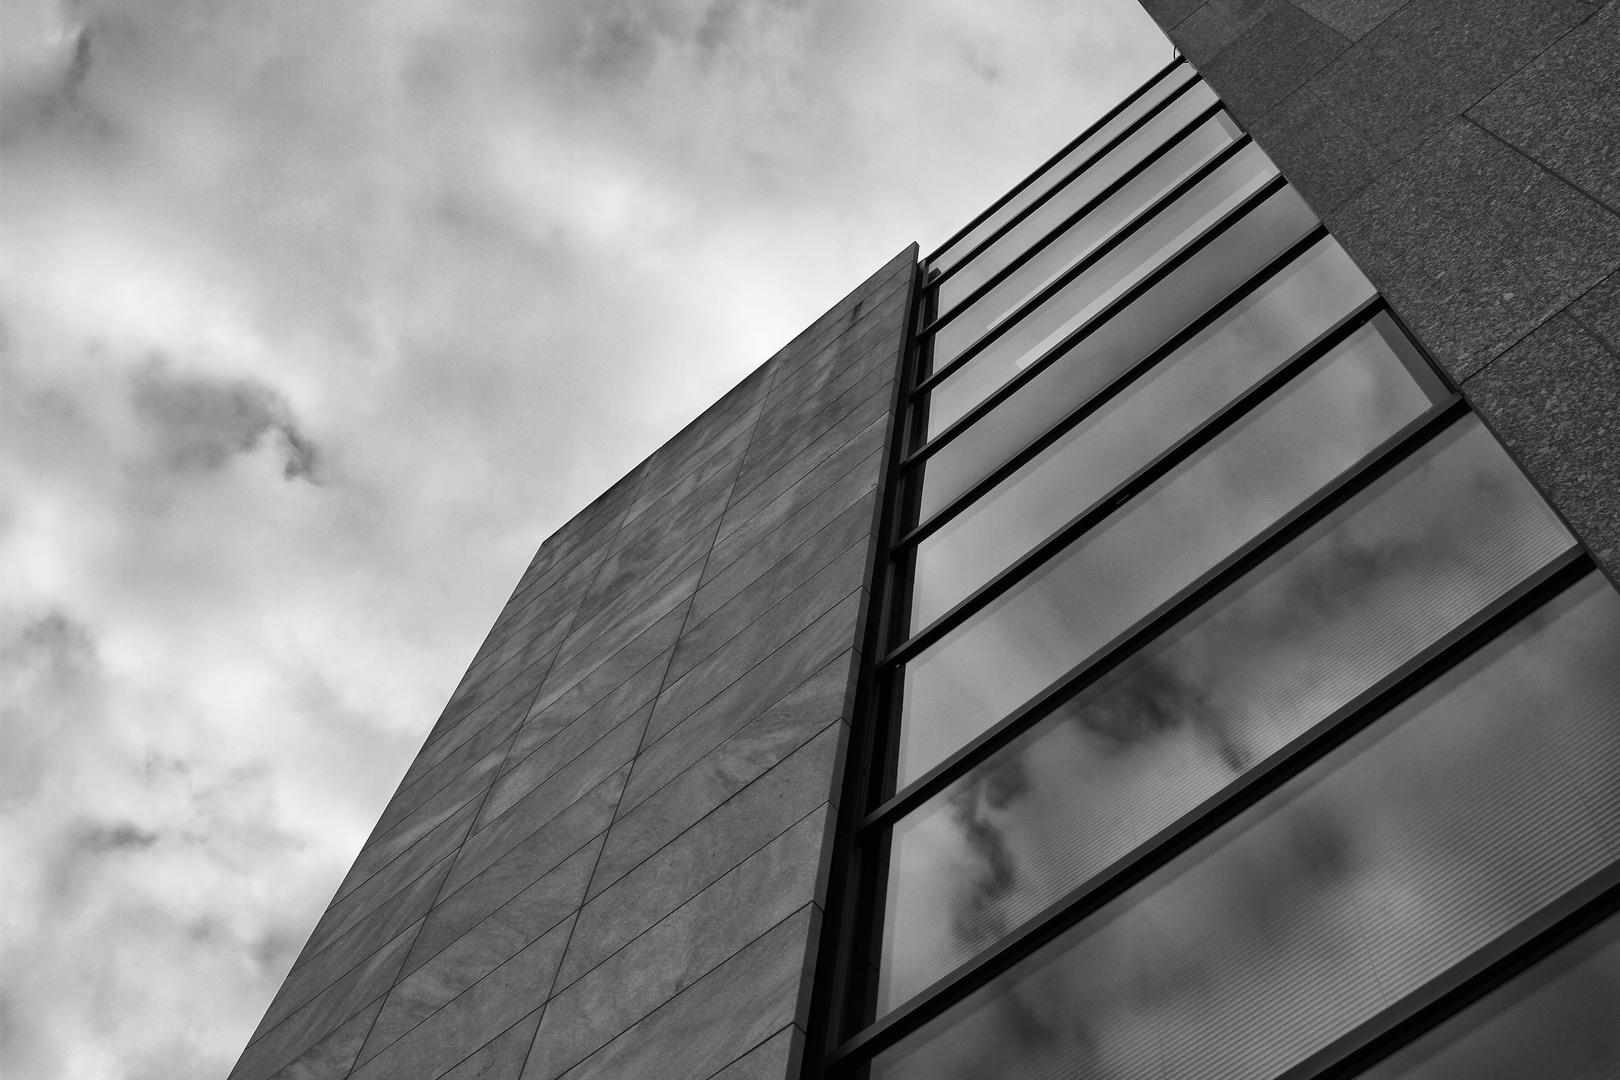 Architektur in Karlsruhe 2